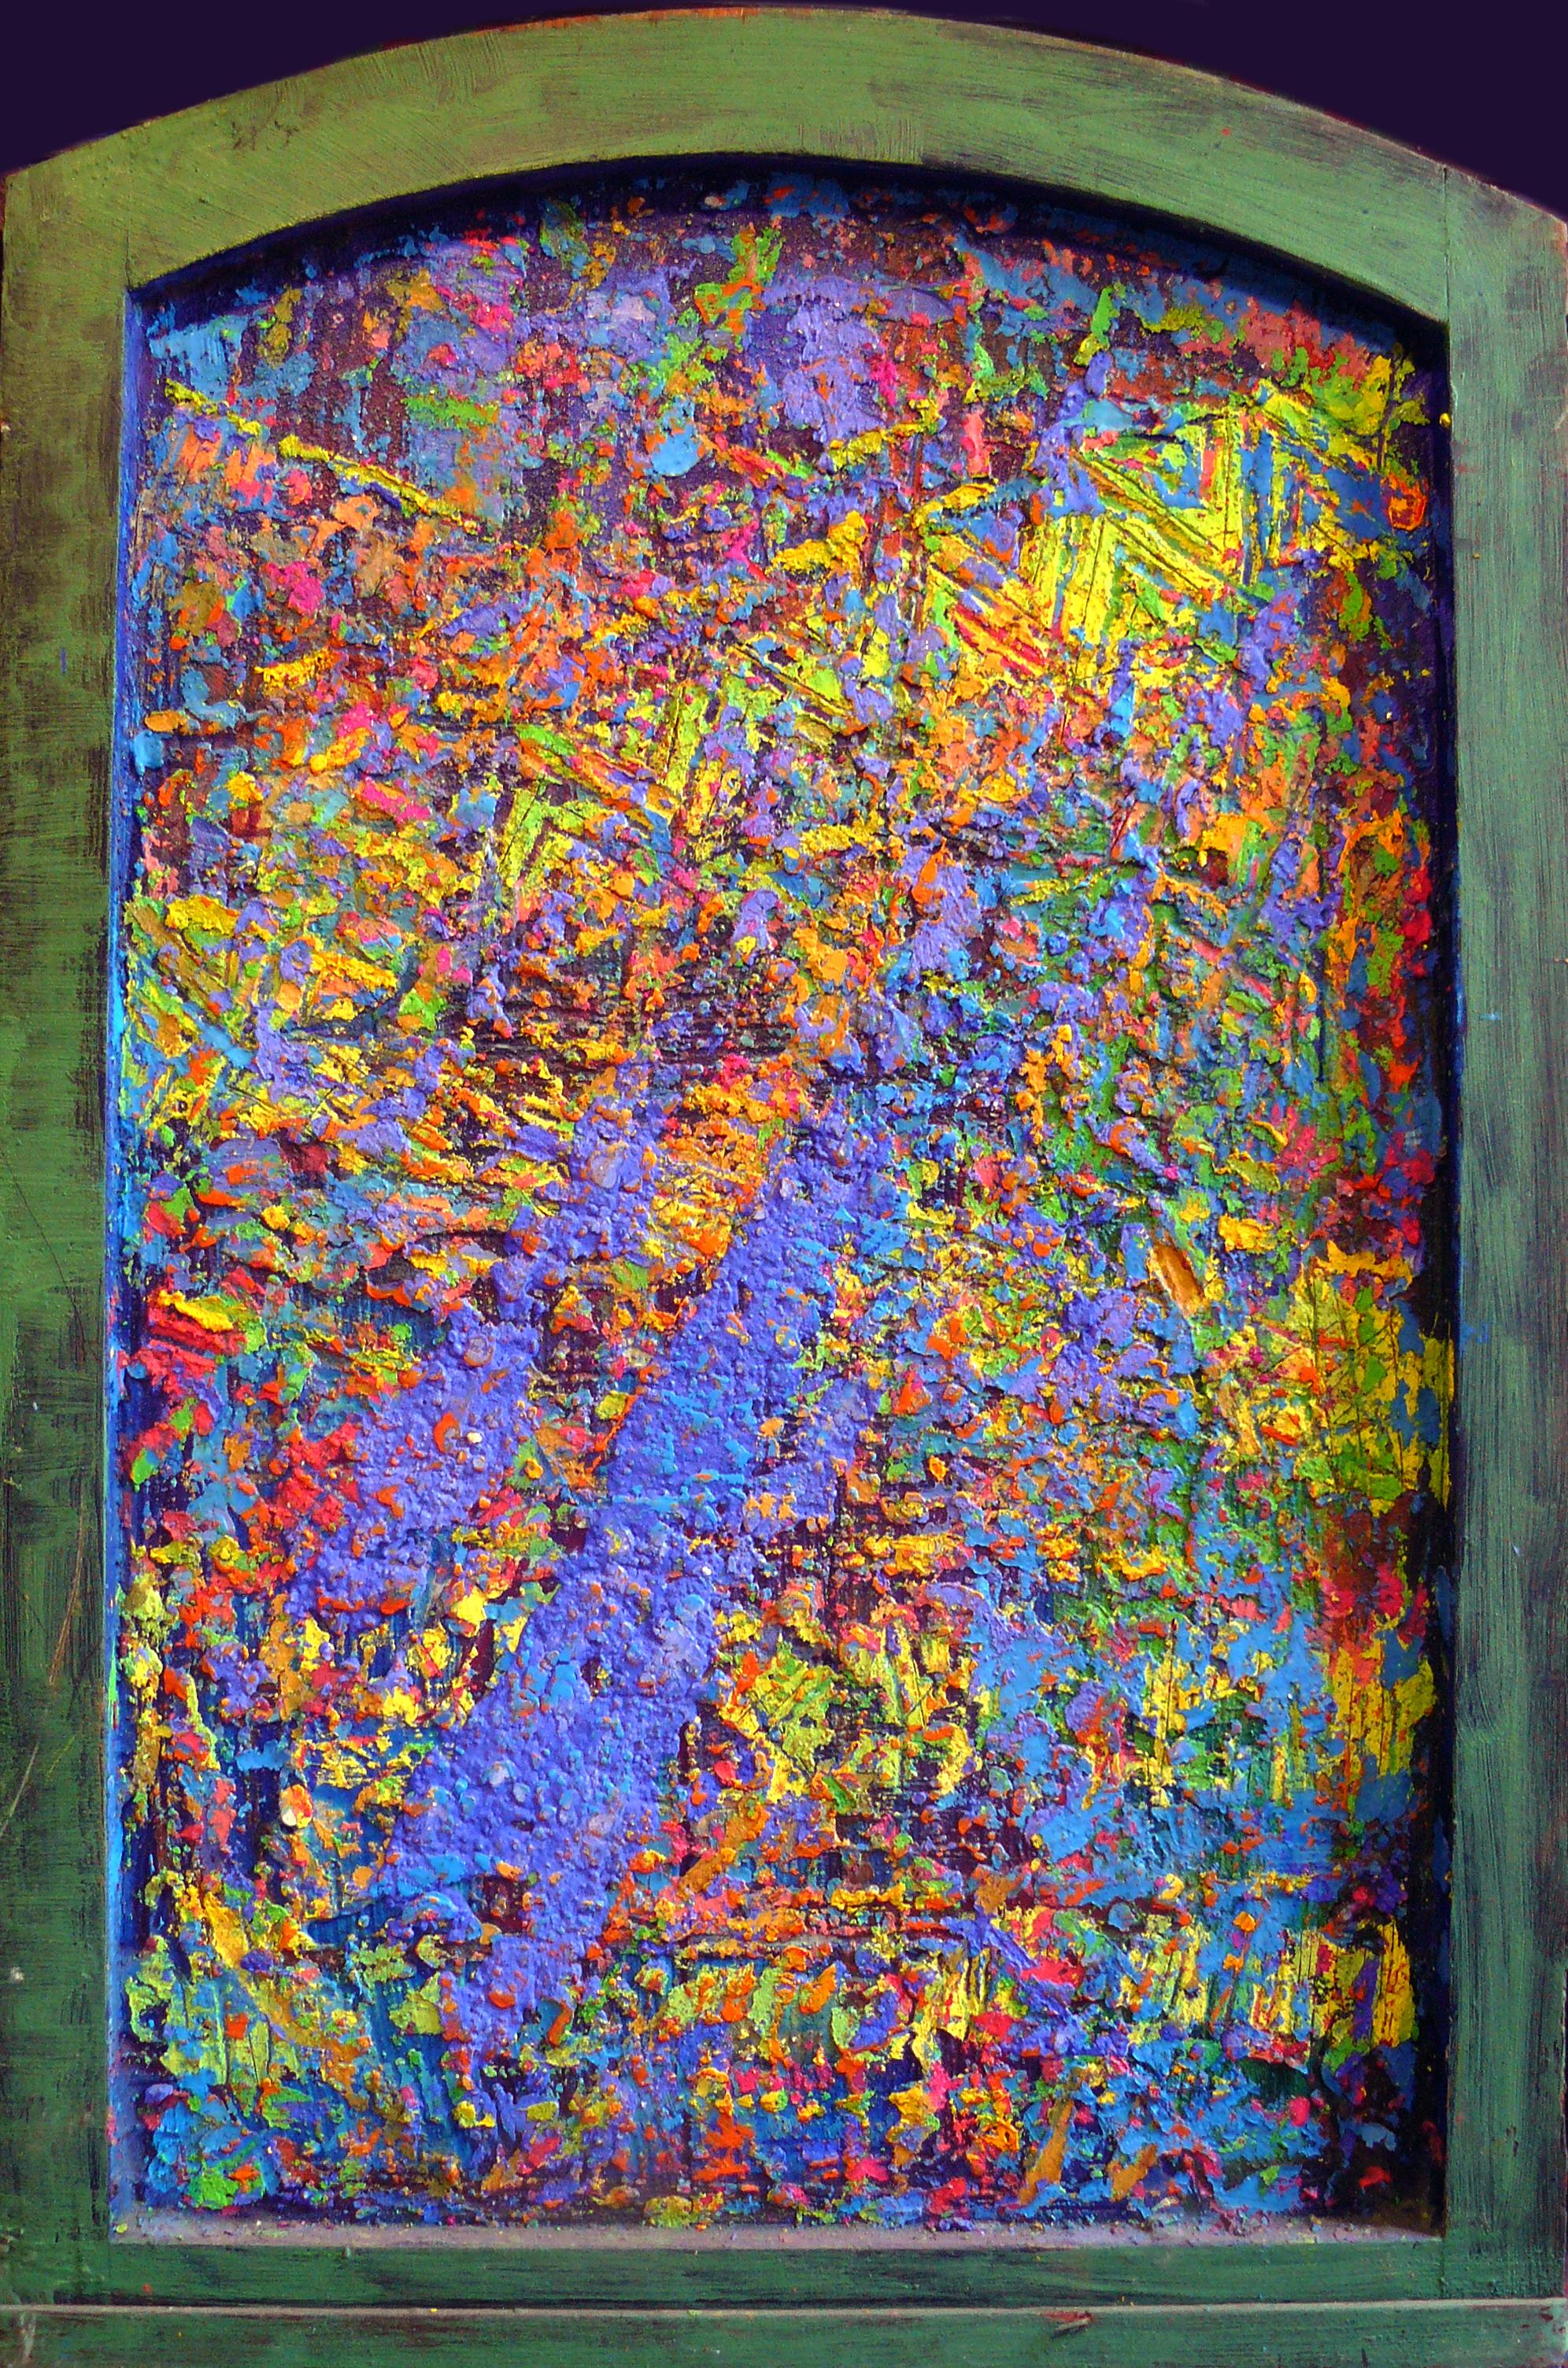 La ventana - 2008 by andresbestardmaggio